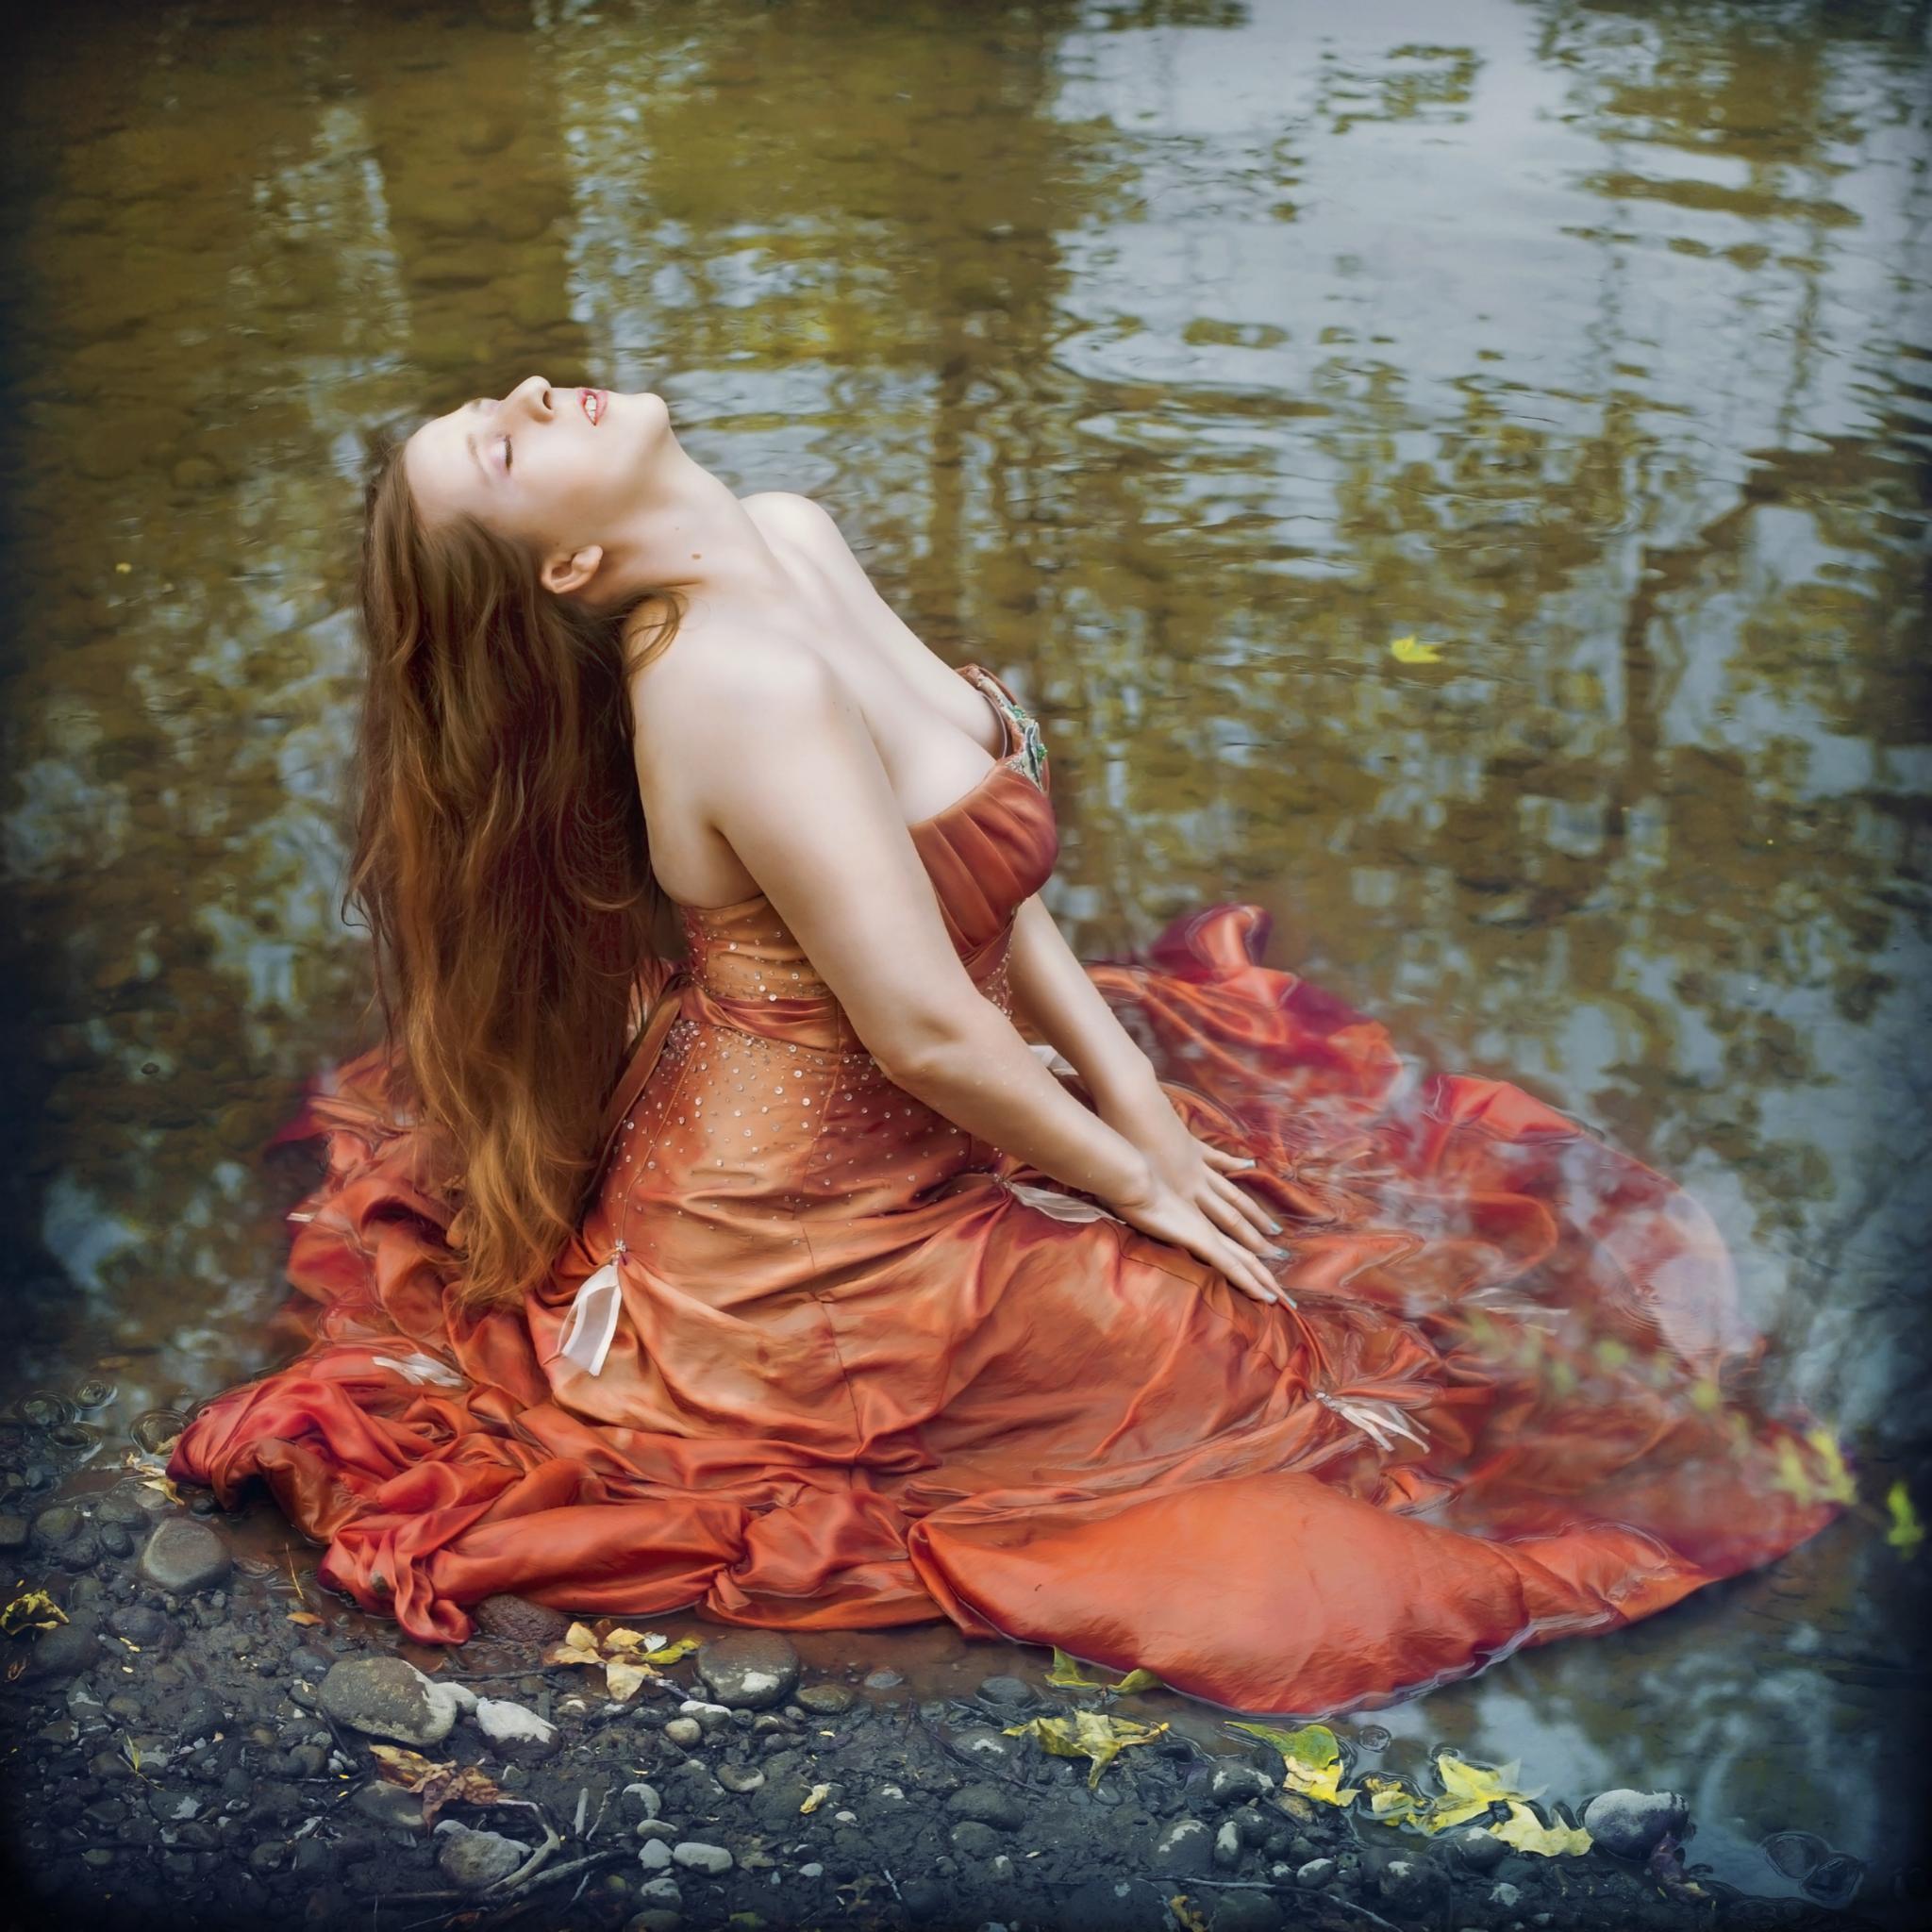 'Romantic Rite' by Natasha Alicia Root